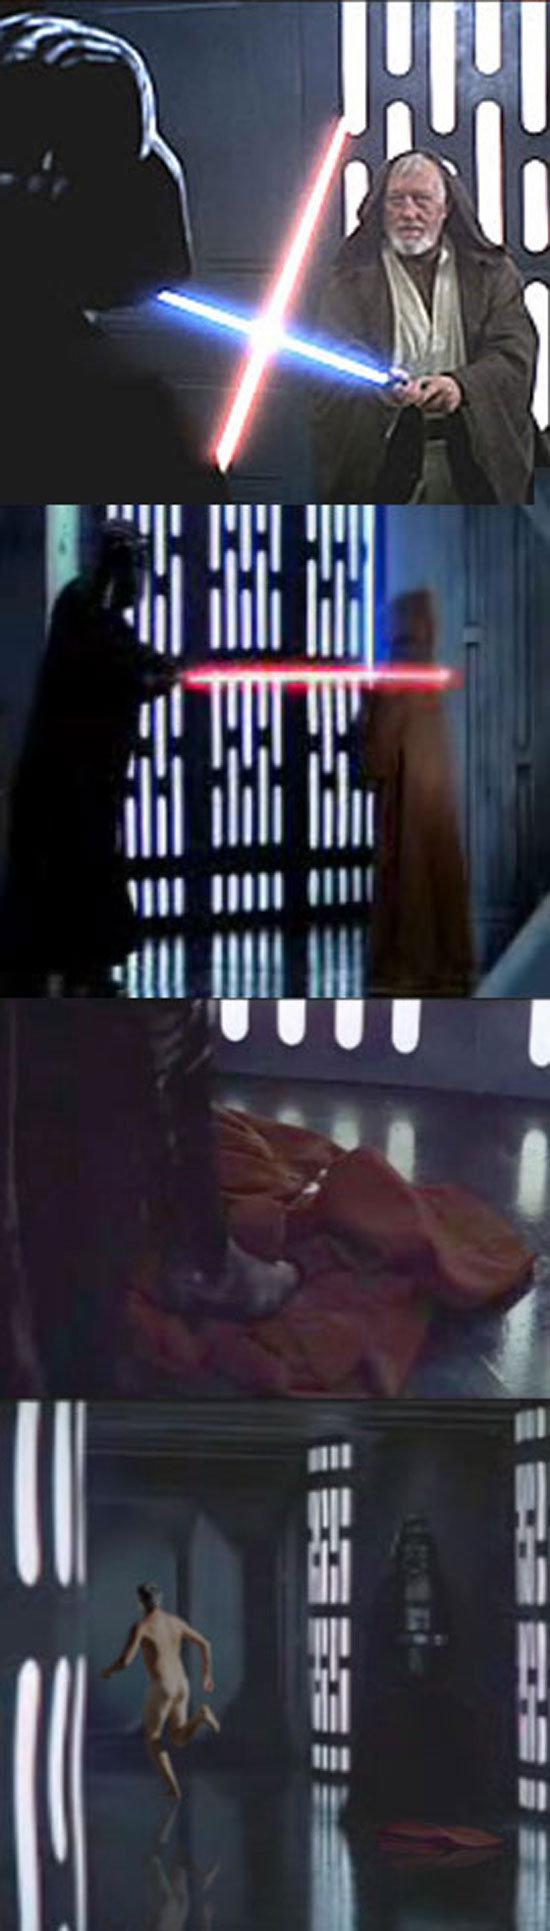 Star Wars. . iii (ii iii!. You're never gonna catch me. see y'all next year. Star Wars iii (ii iii! You're never gonna catch me see y'all next year